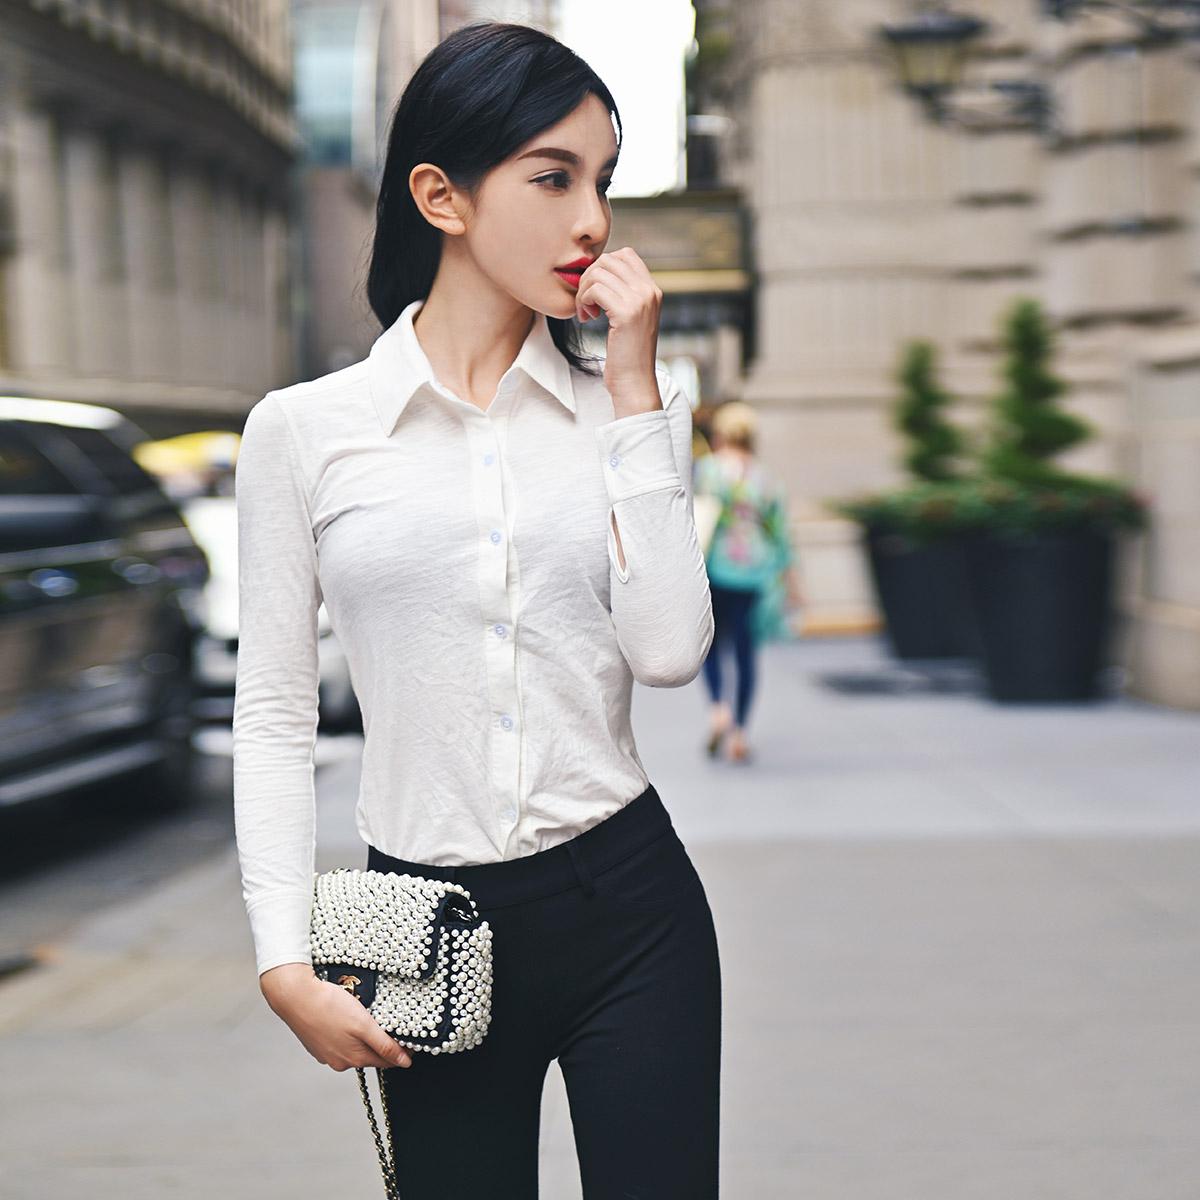 RuolinDiam秋款纯棉气质职业衬衫女白衬衫长袖女上衣蓝色衬衫女(用1元券)